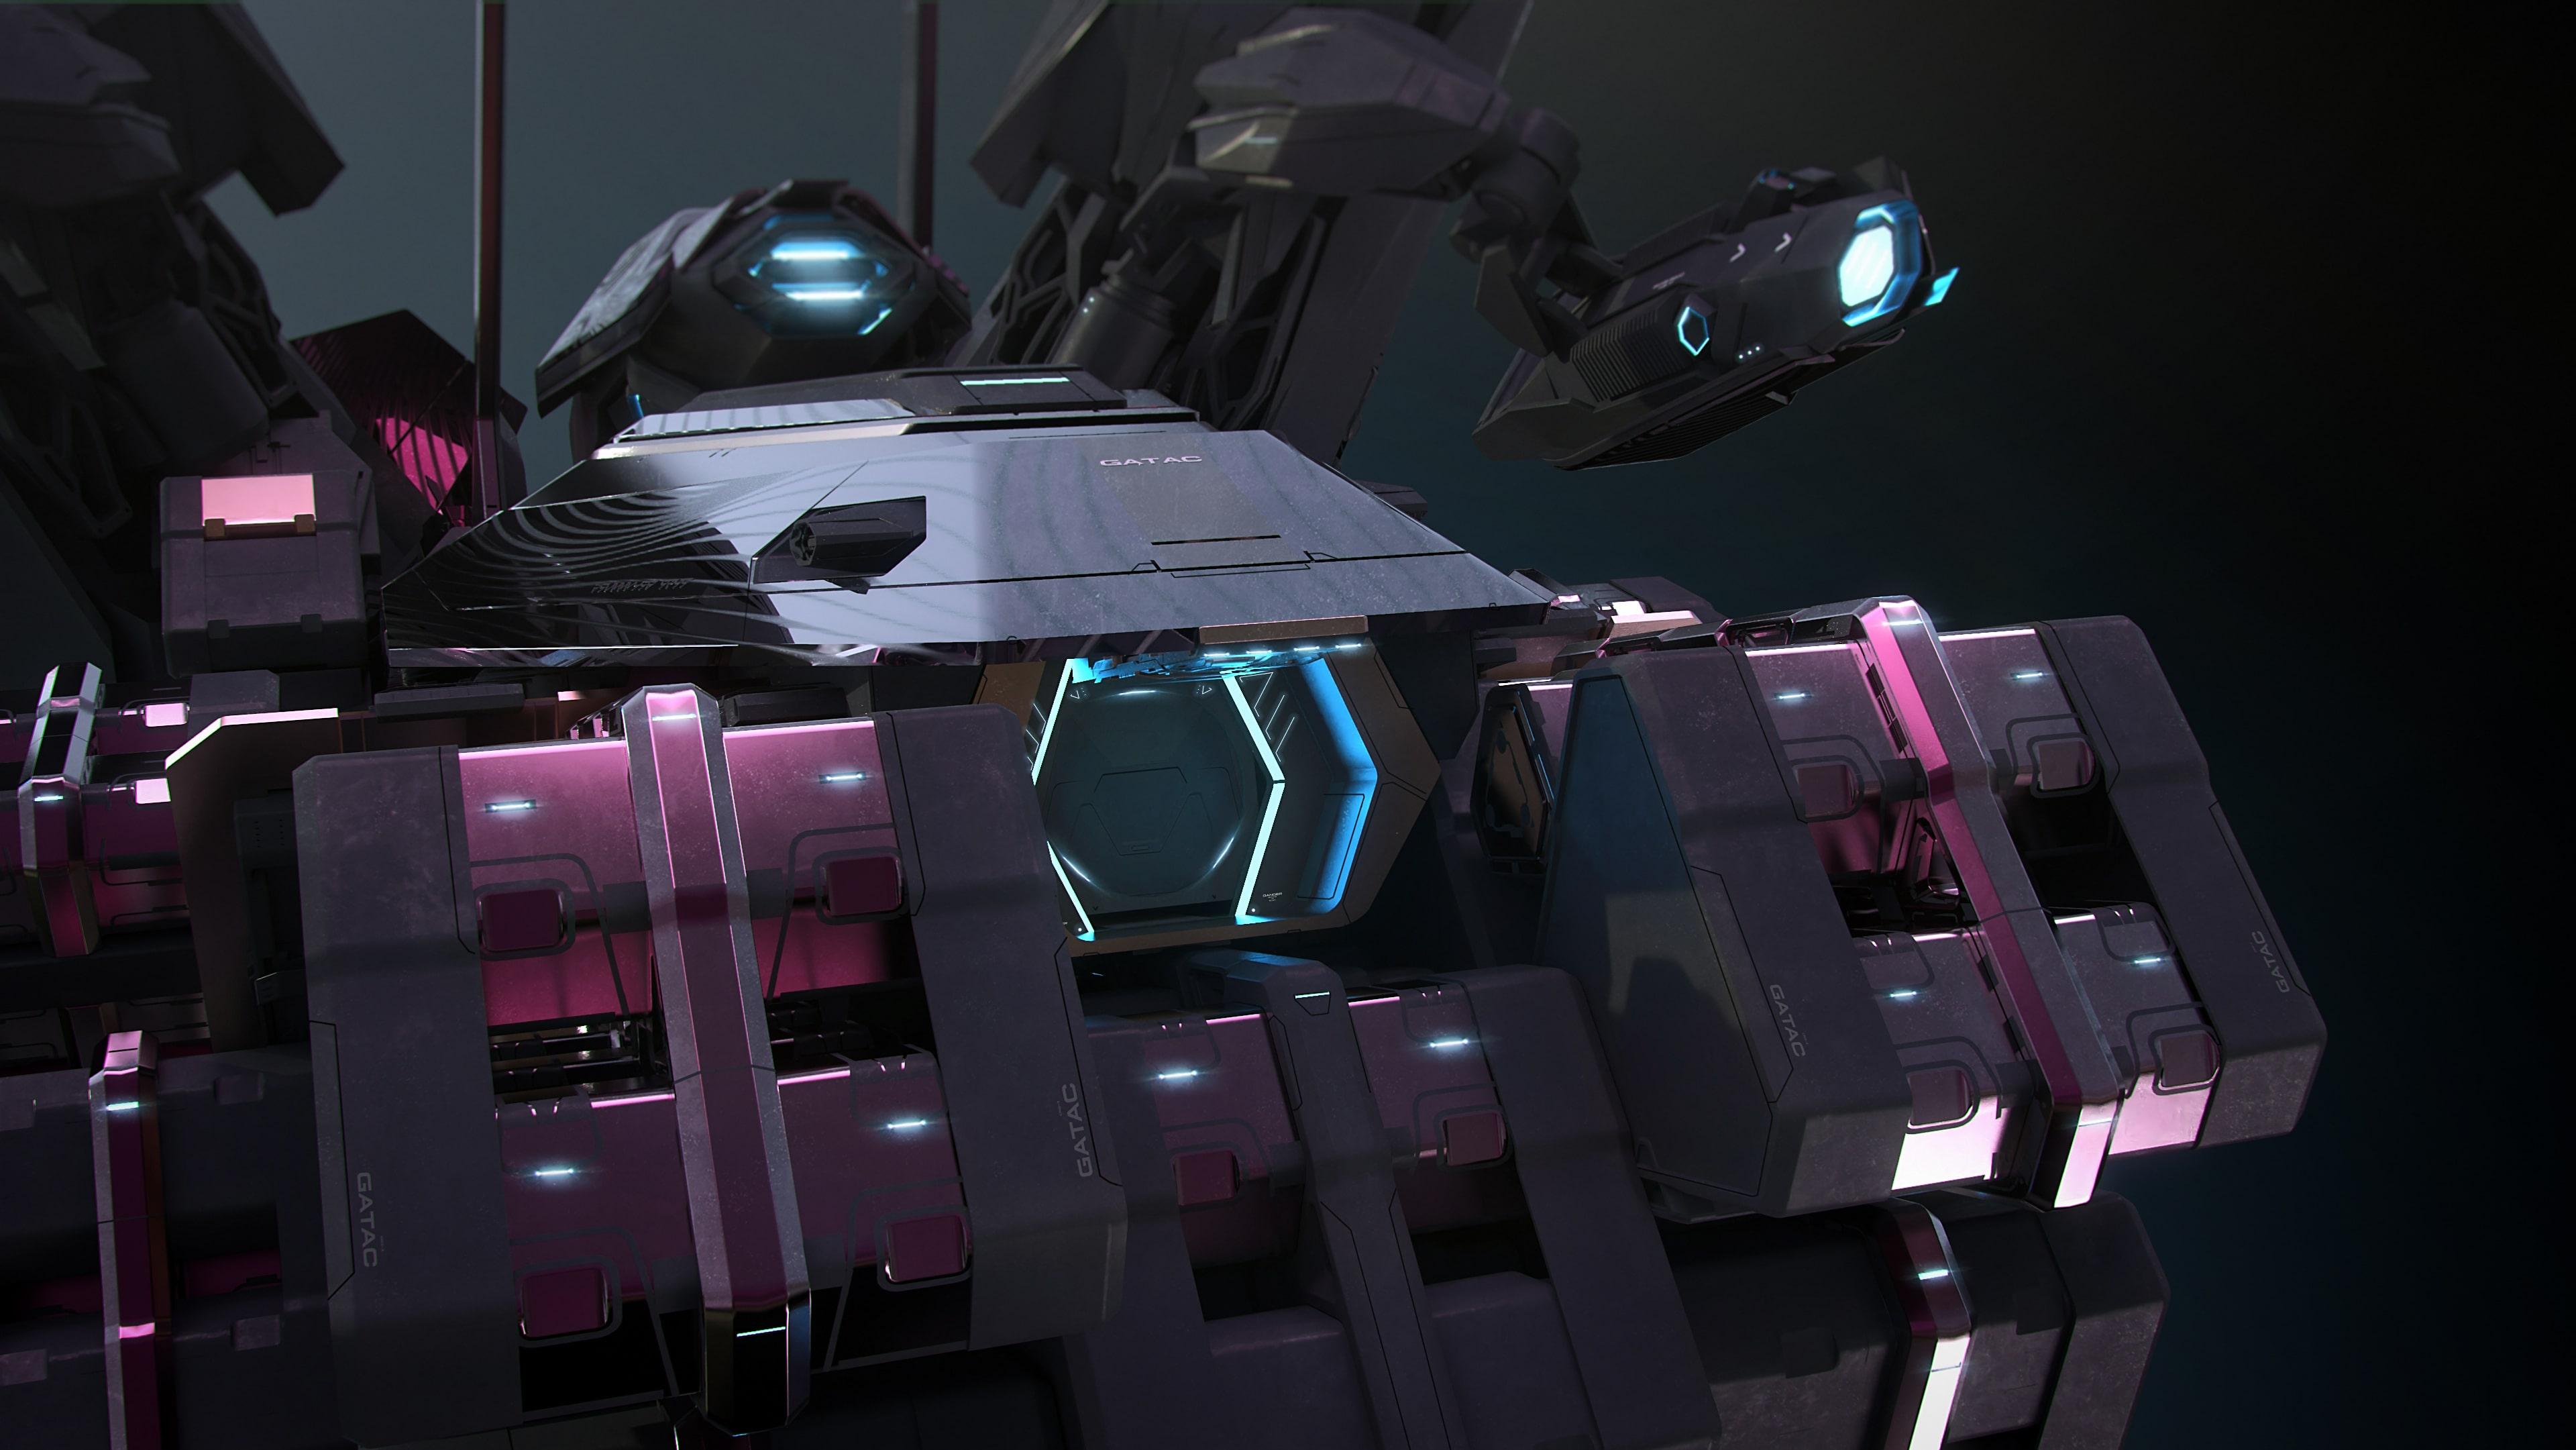 Xian_Cargo_Small_Promo_CU_Docking_PJ02-Min